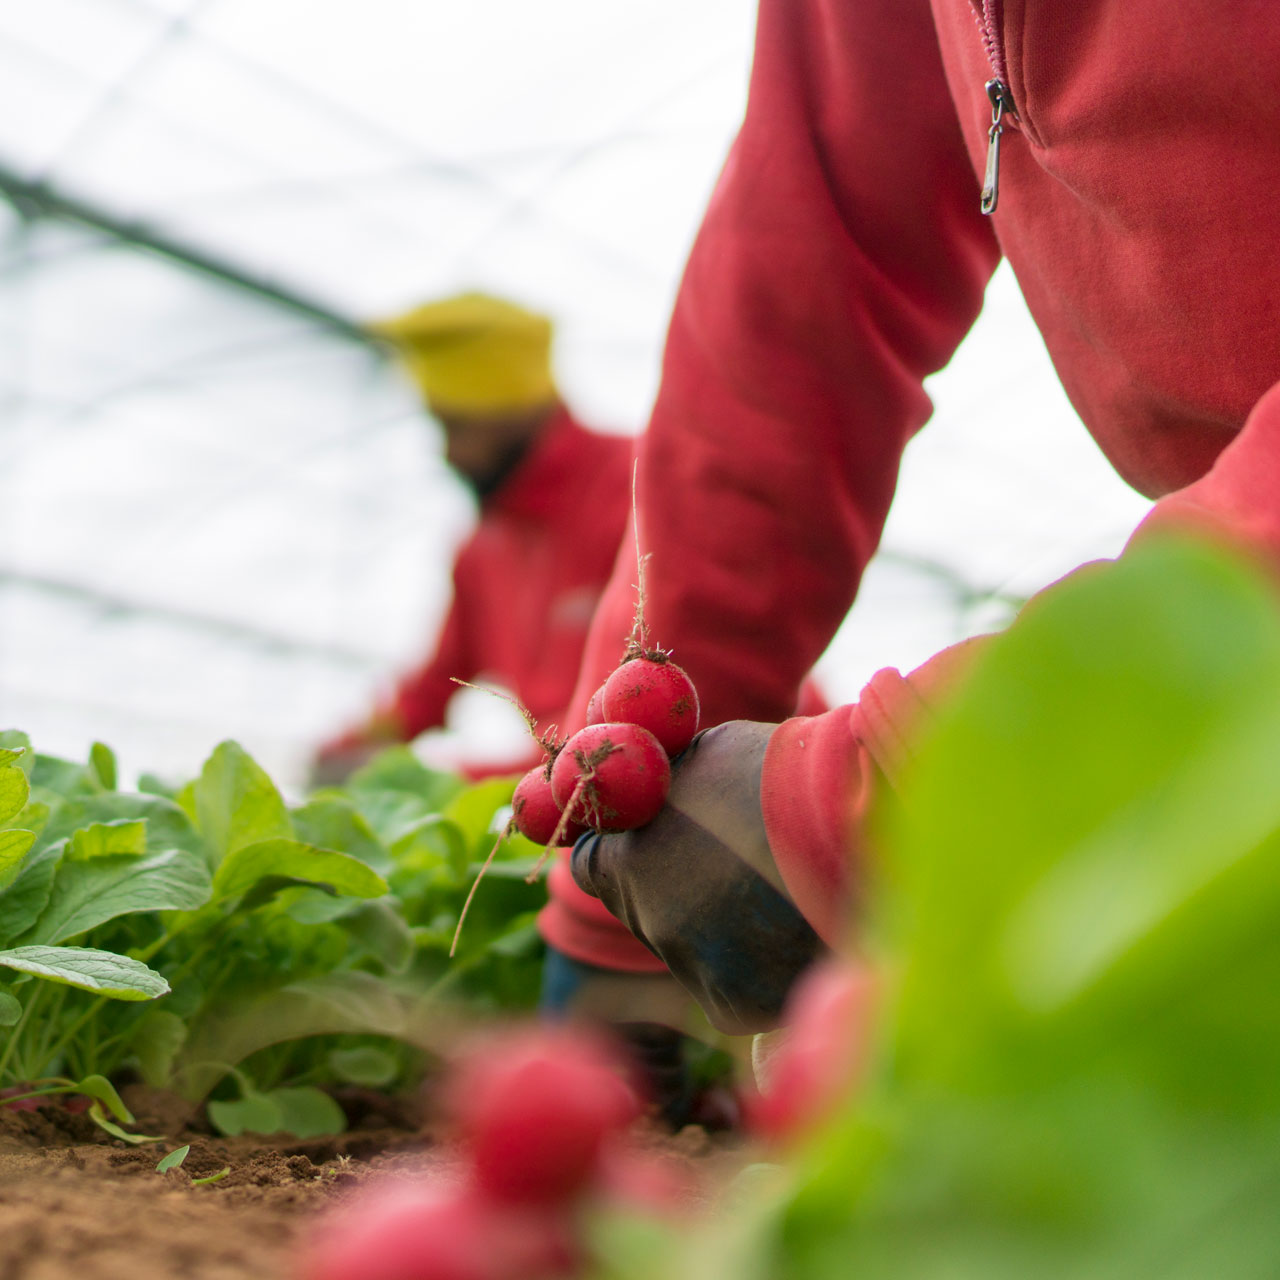 Borgo Grappa harvesting